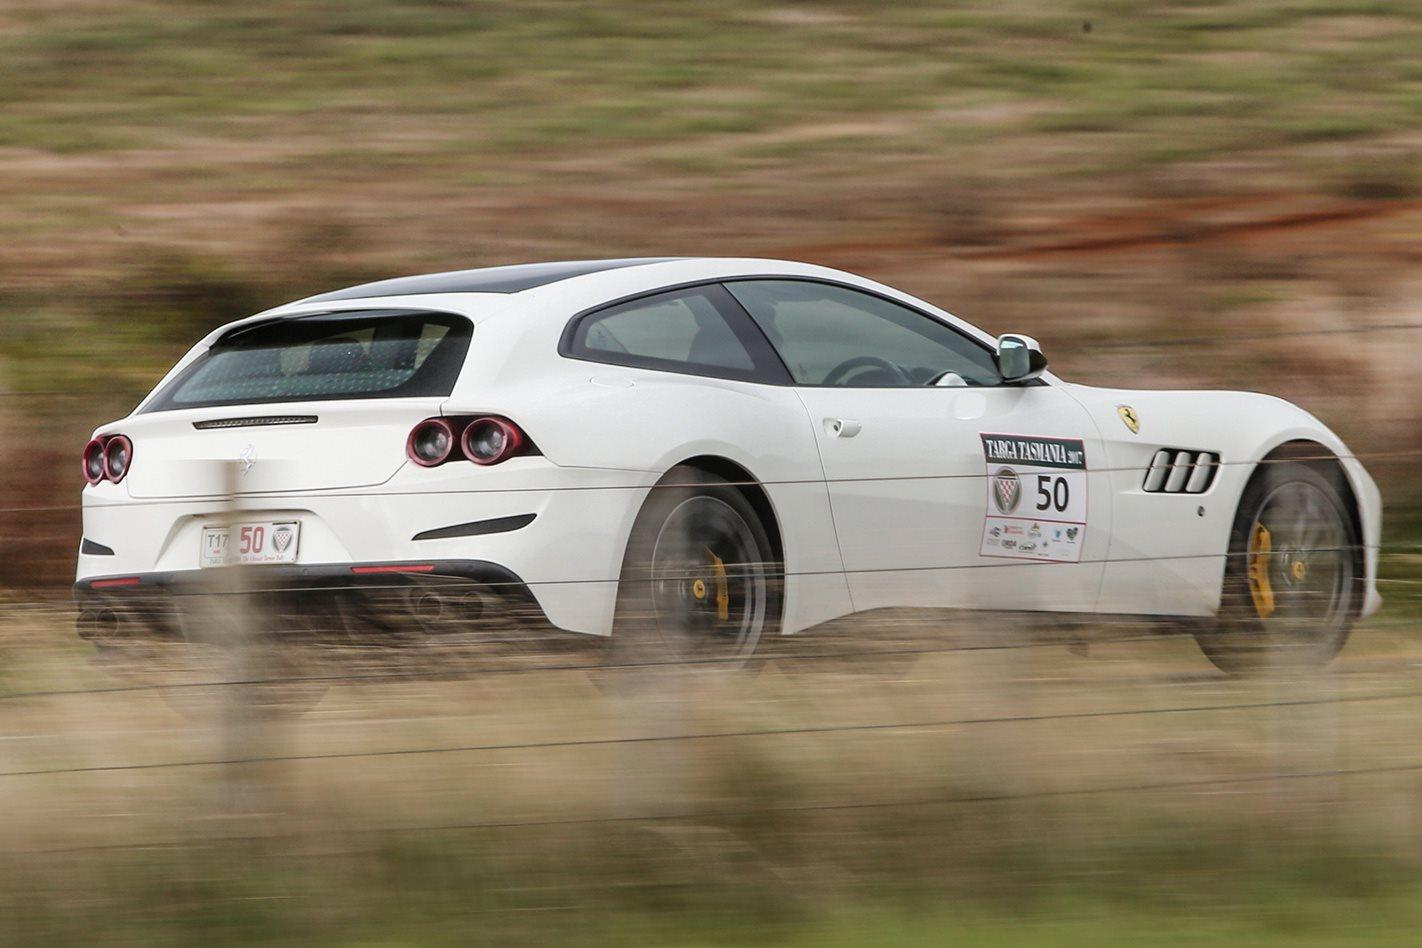 2017 Ferrari GTC4 Lusso driving